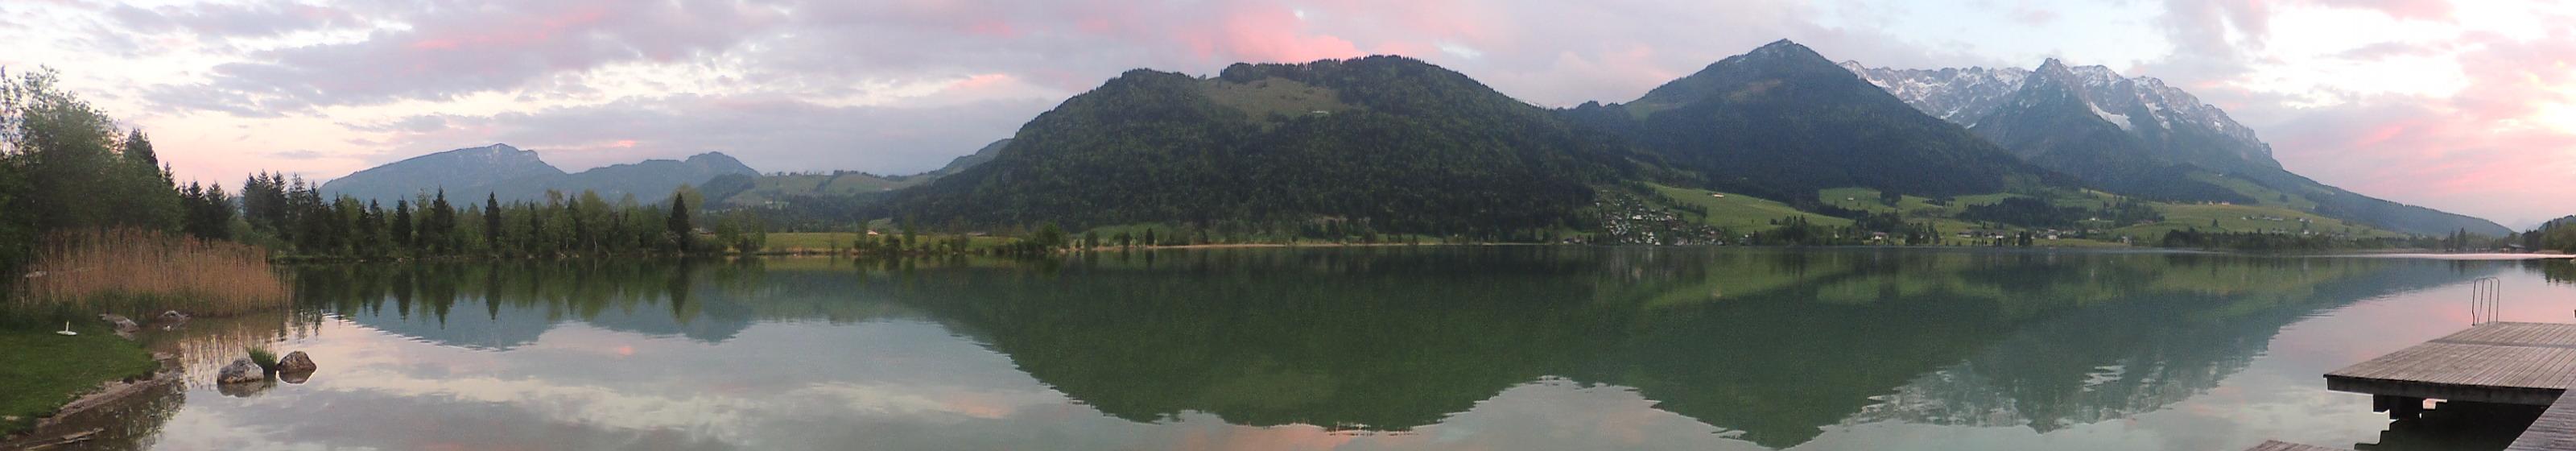 Walchsee Panorama